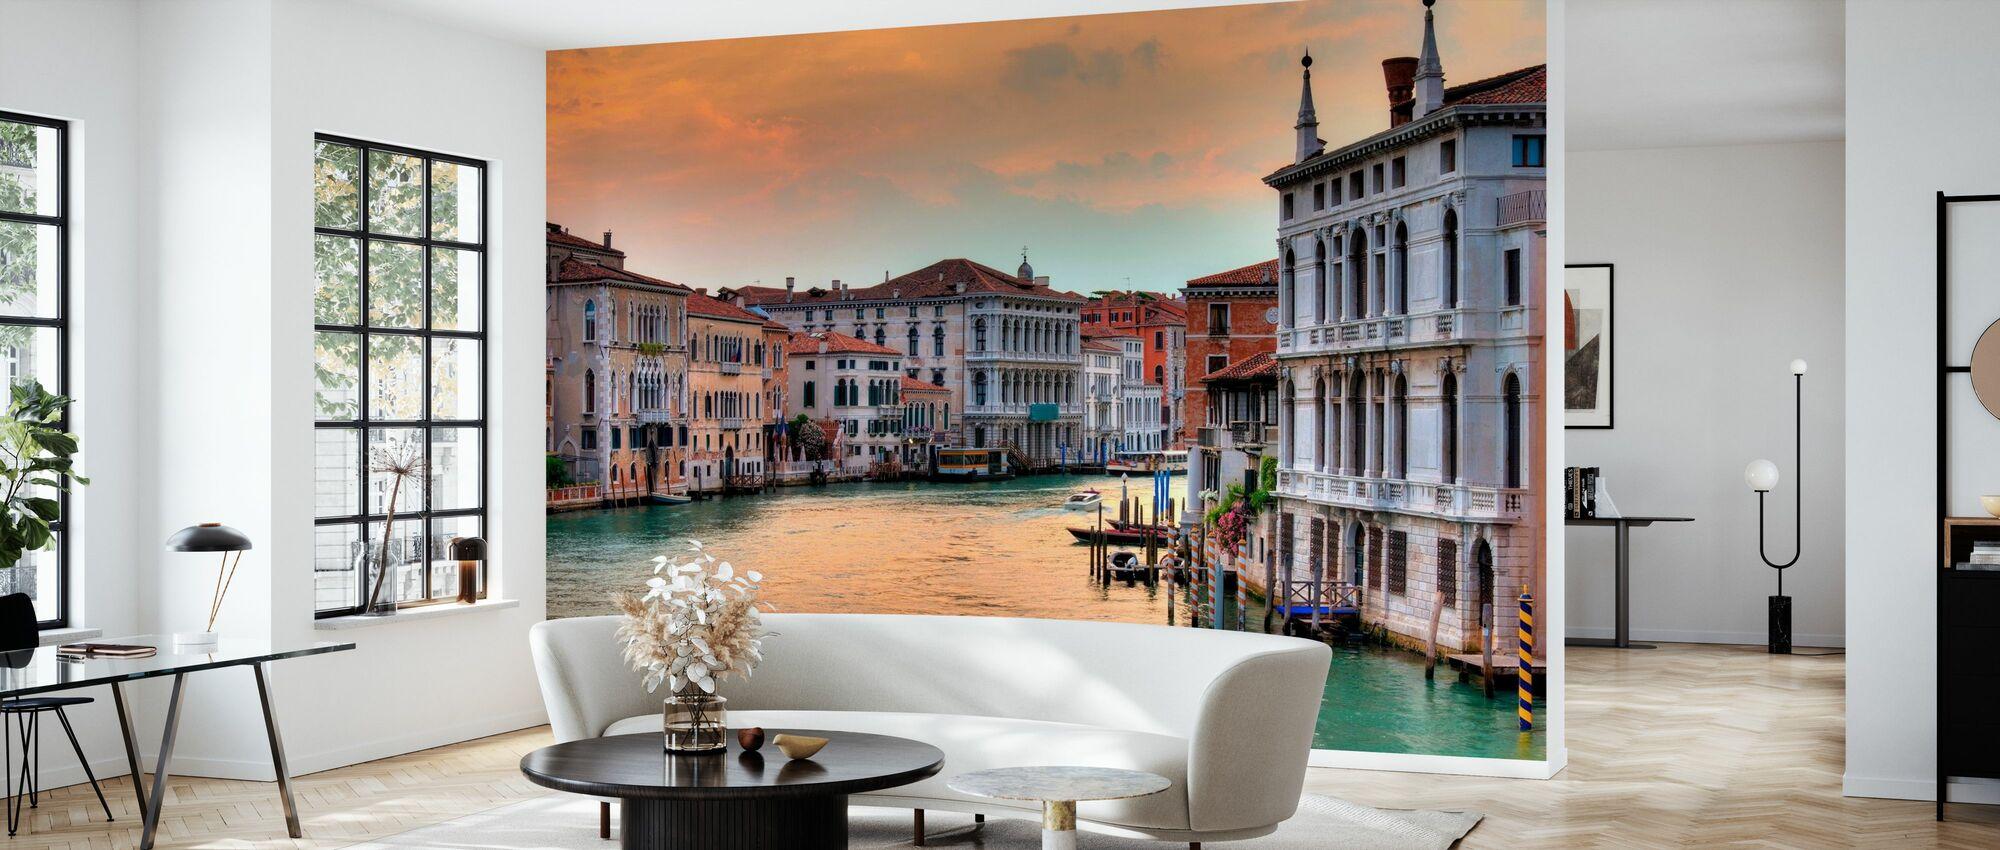 Grand Canal at Dusk - Wallpaper - Living Room